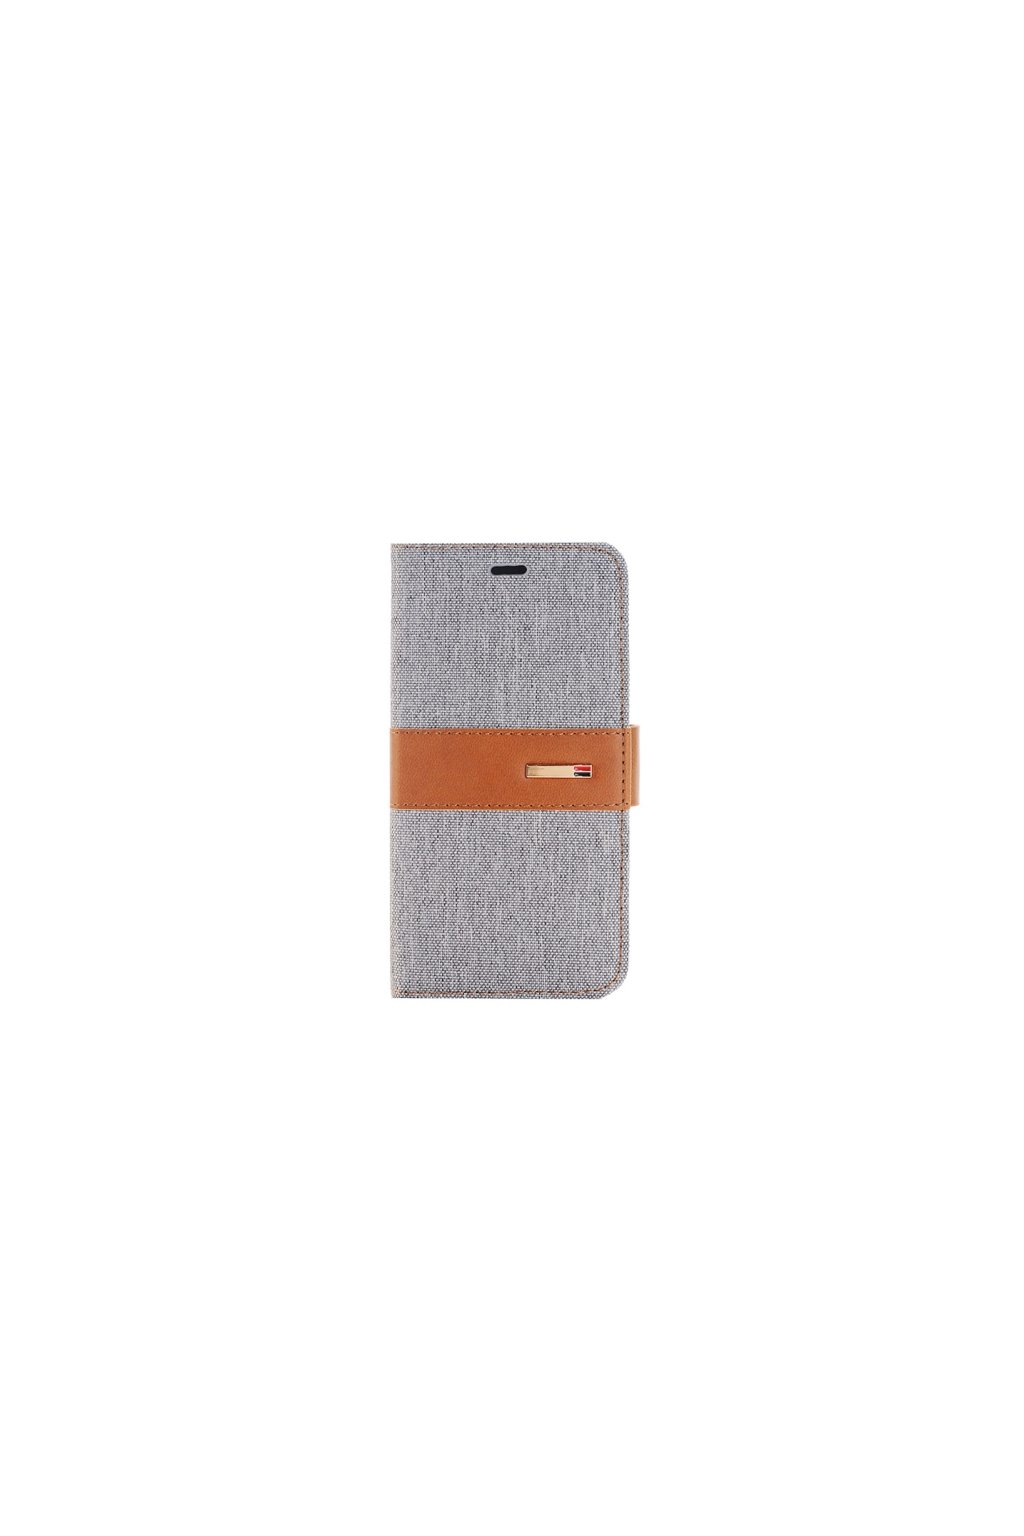 Apple iPhone 6/6S pouzdro flip DENIM, Grey